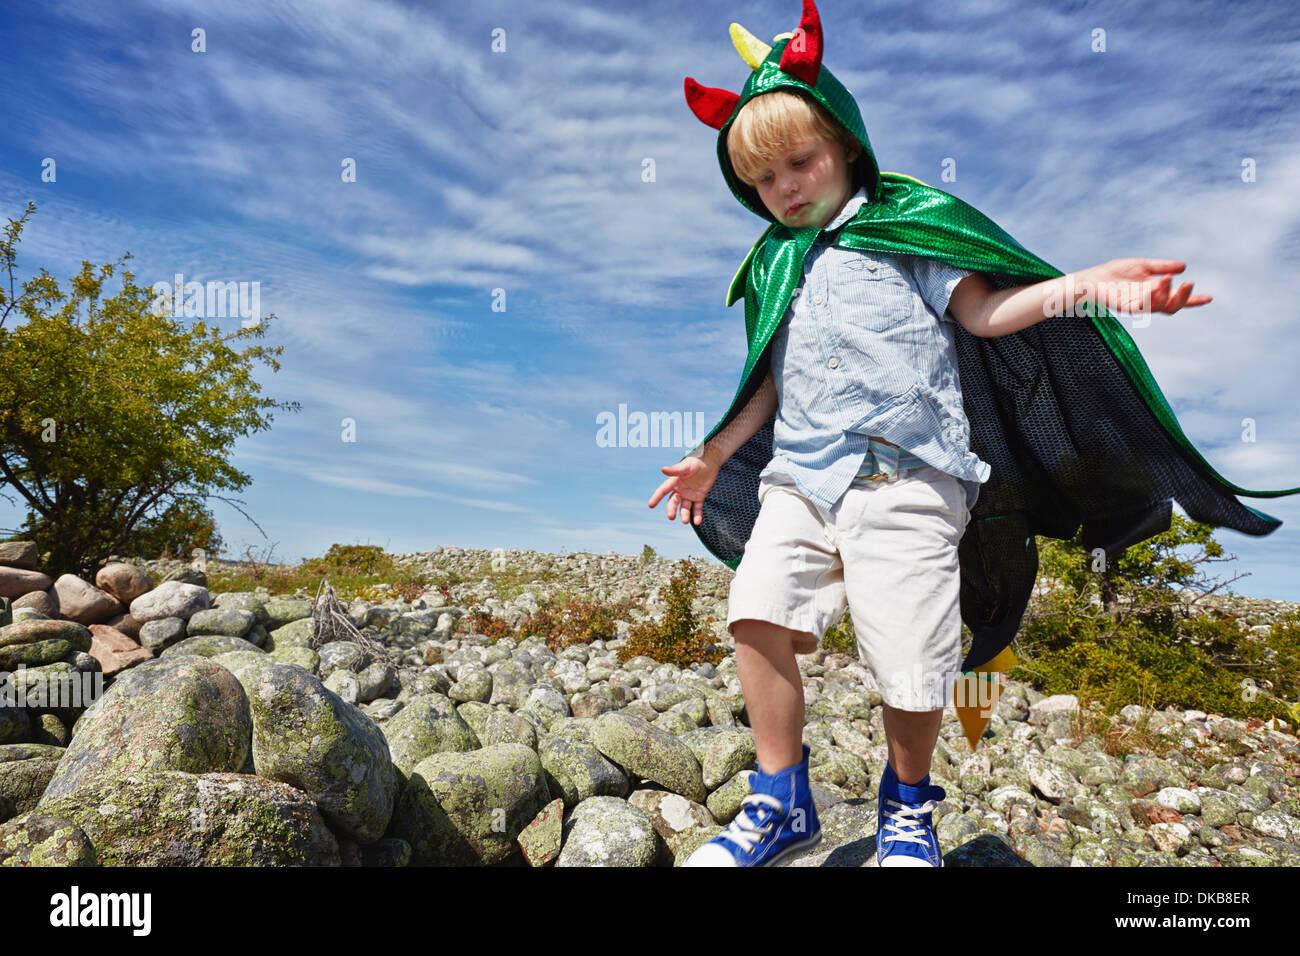 Boy wearing green cape walking on pebbles, Eggergrund, Sweden - Stock Image